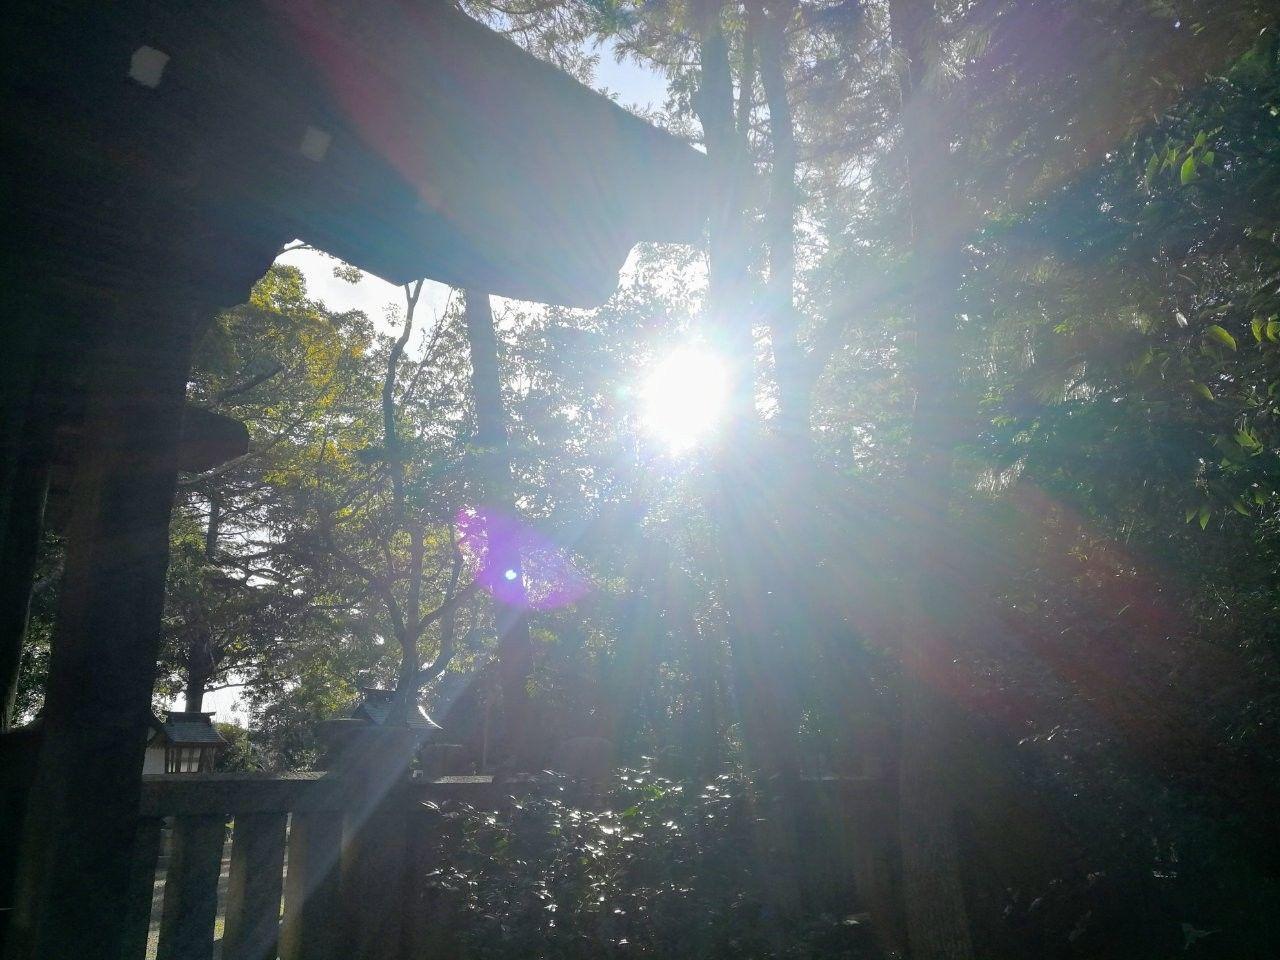 f:id:adagio-nijiiro:20190130205400j:image